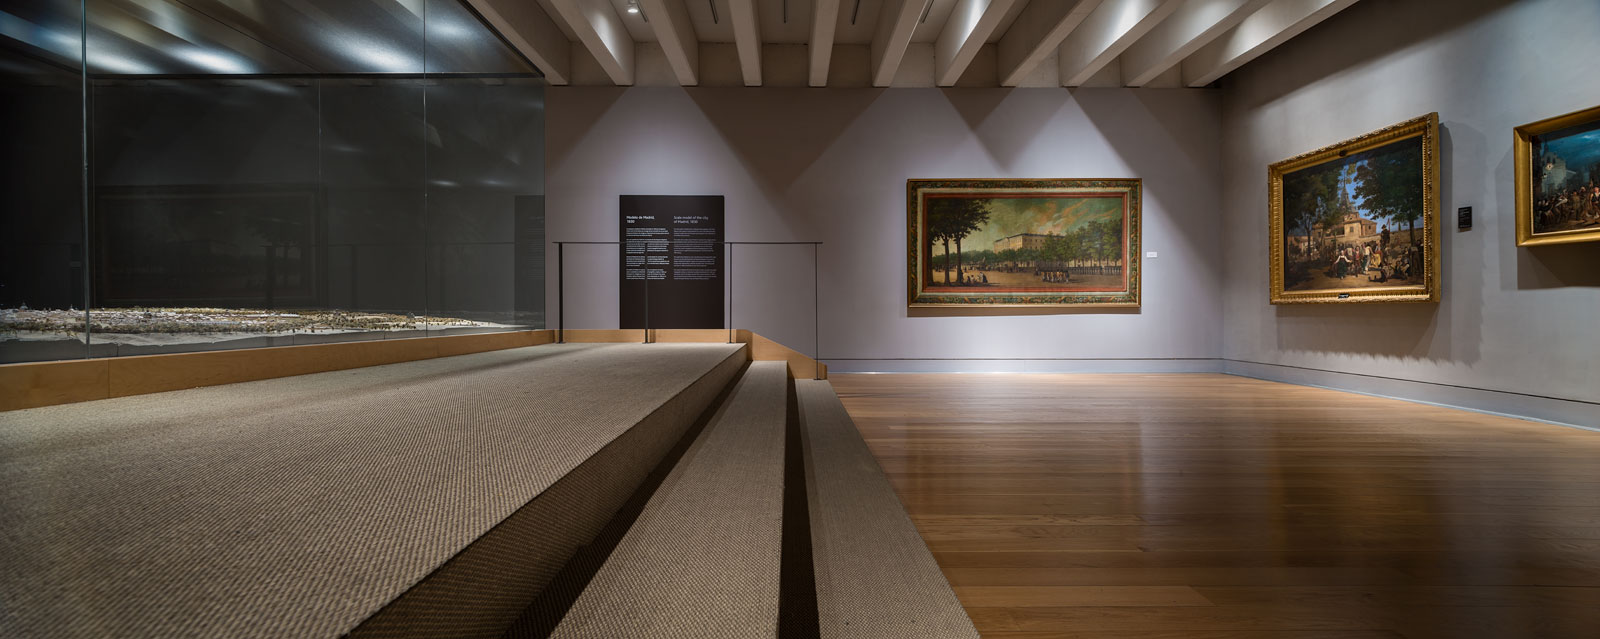 Museo de Historia de Madrid · Ypuntoending · 003.jpg